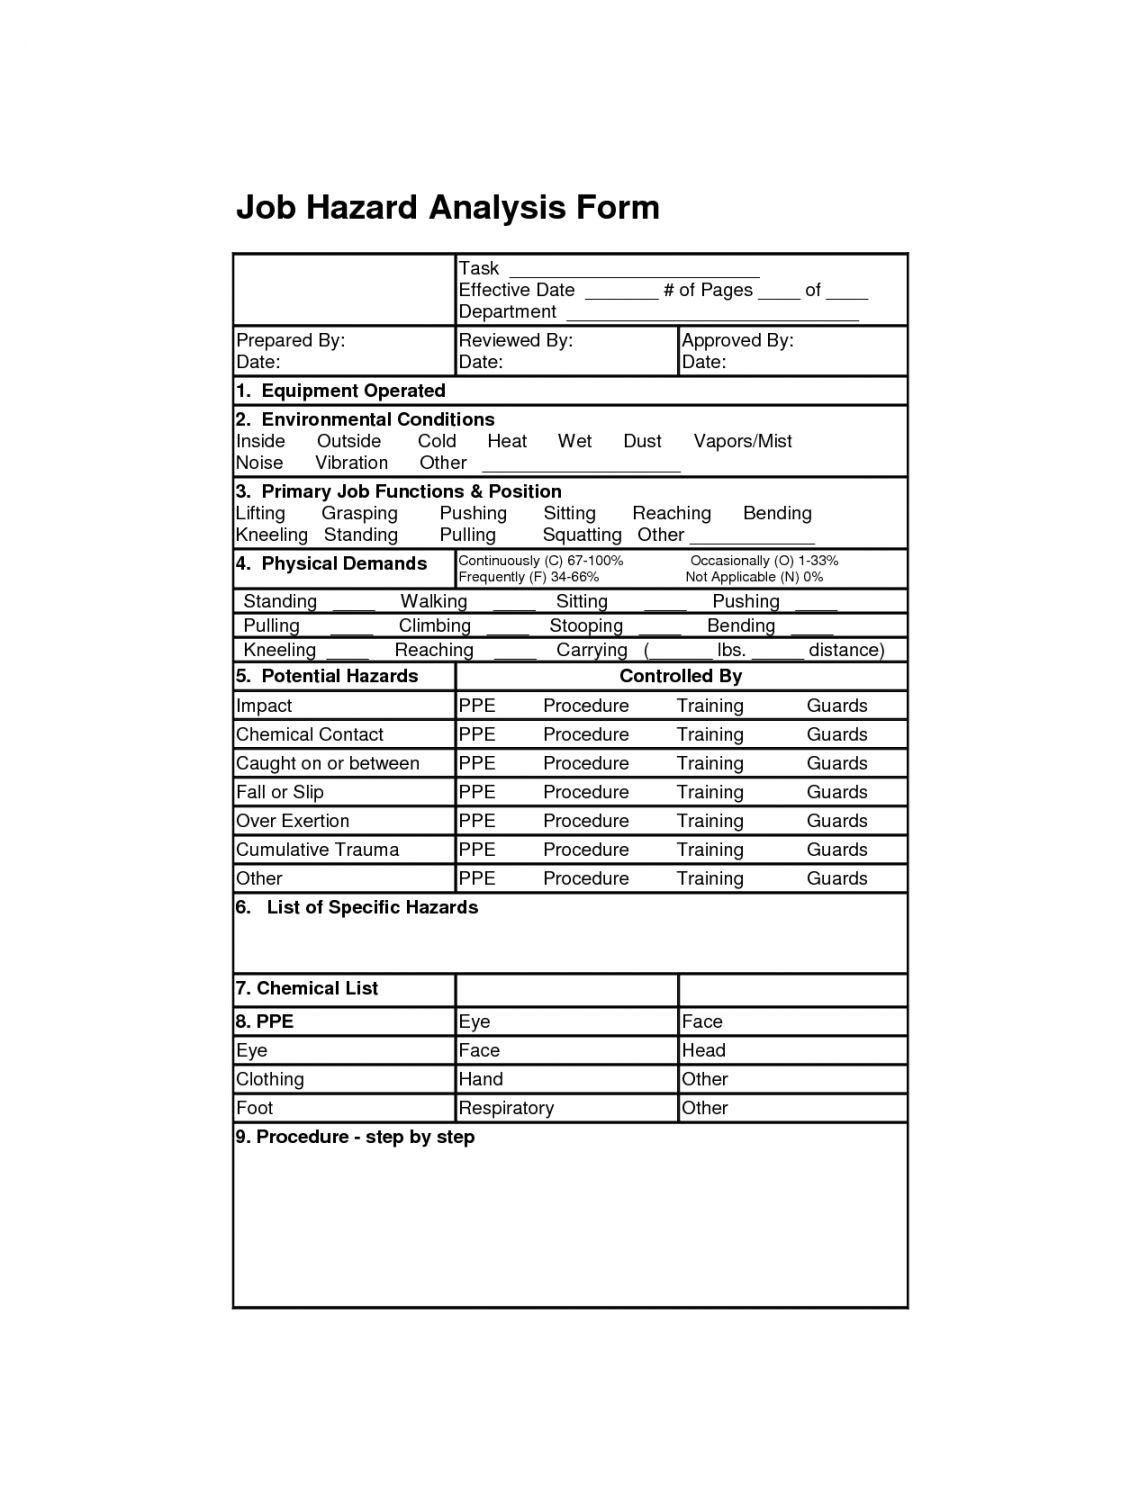 free job hazard analysis form job analysis forms job